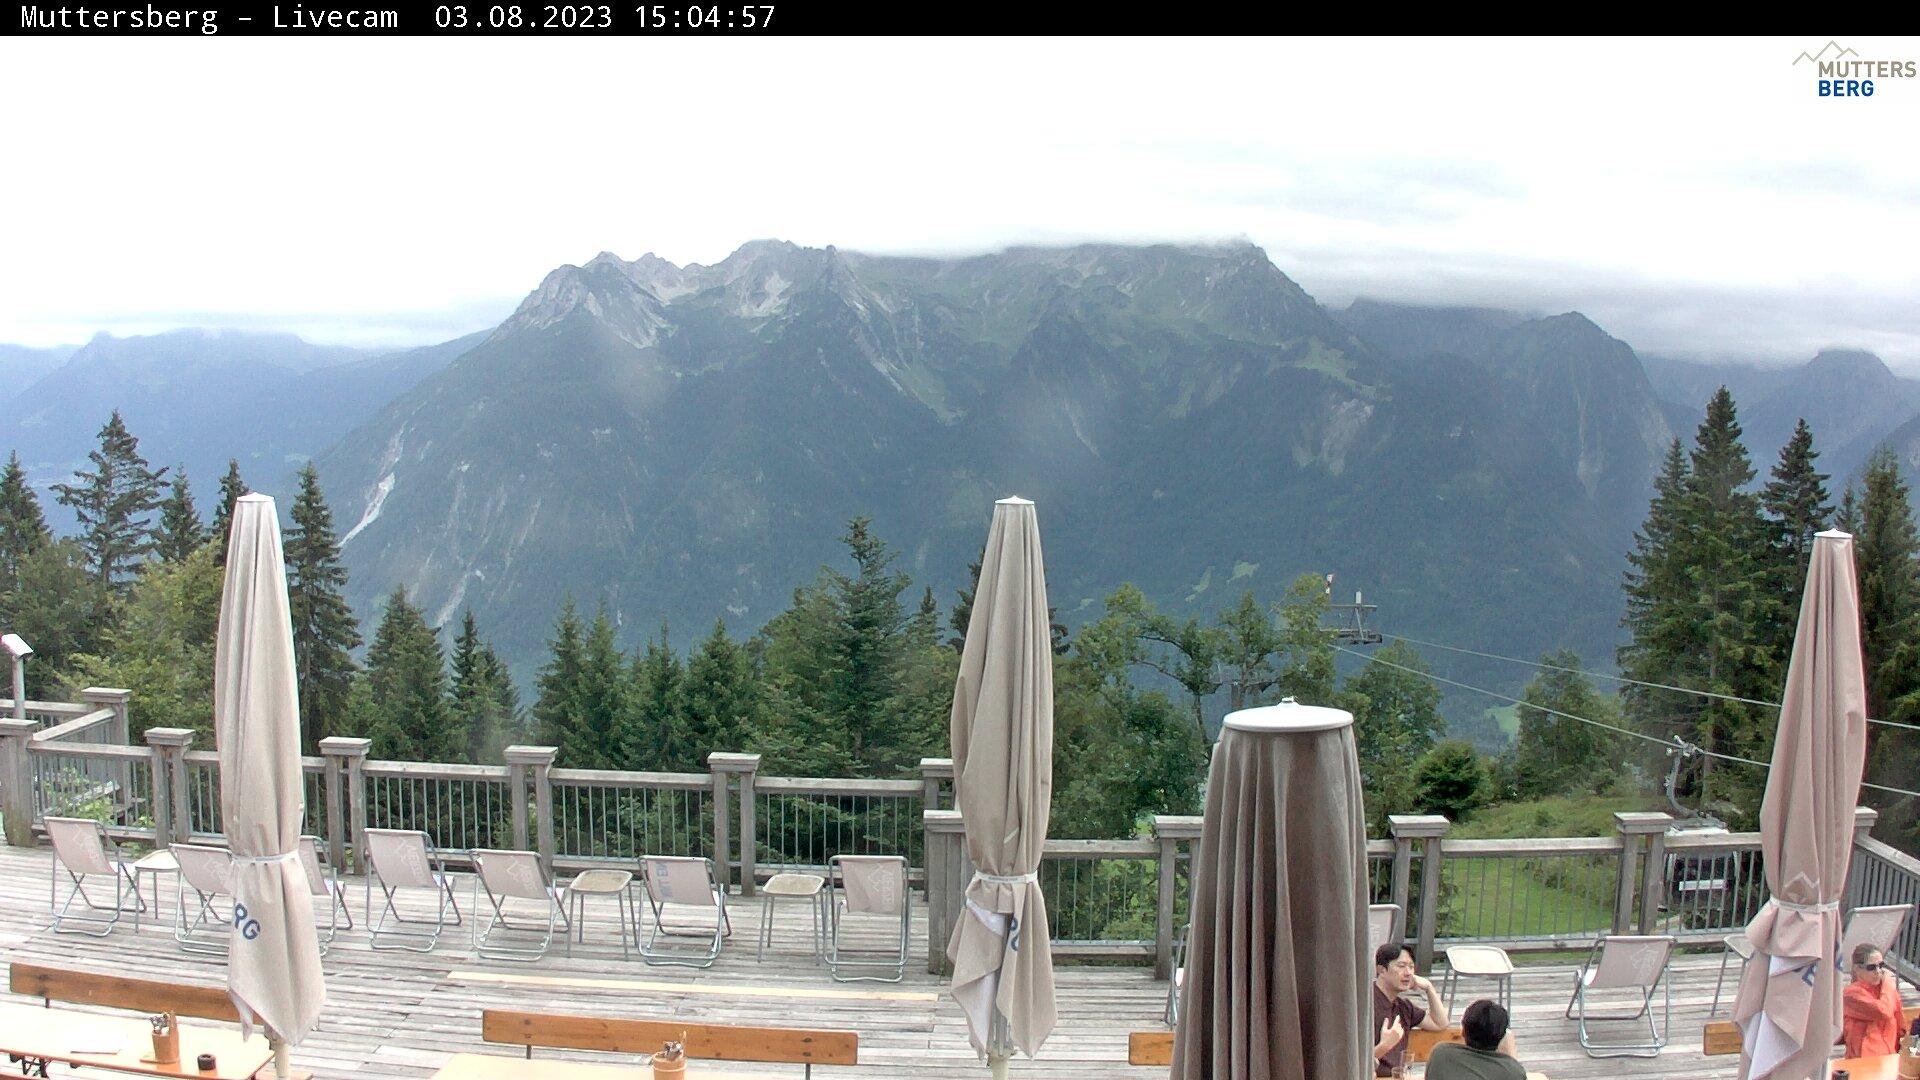 Vorarlberg singletrail